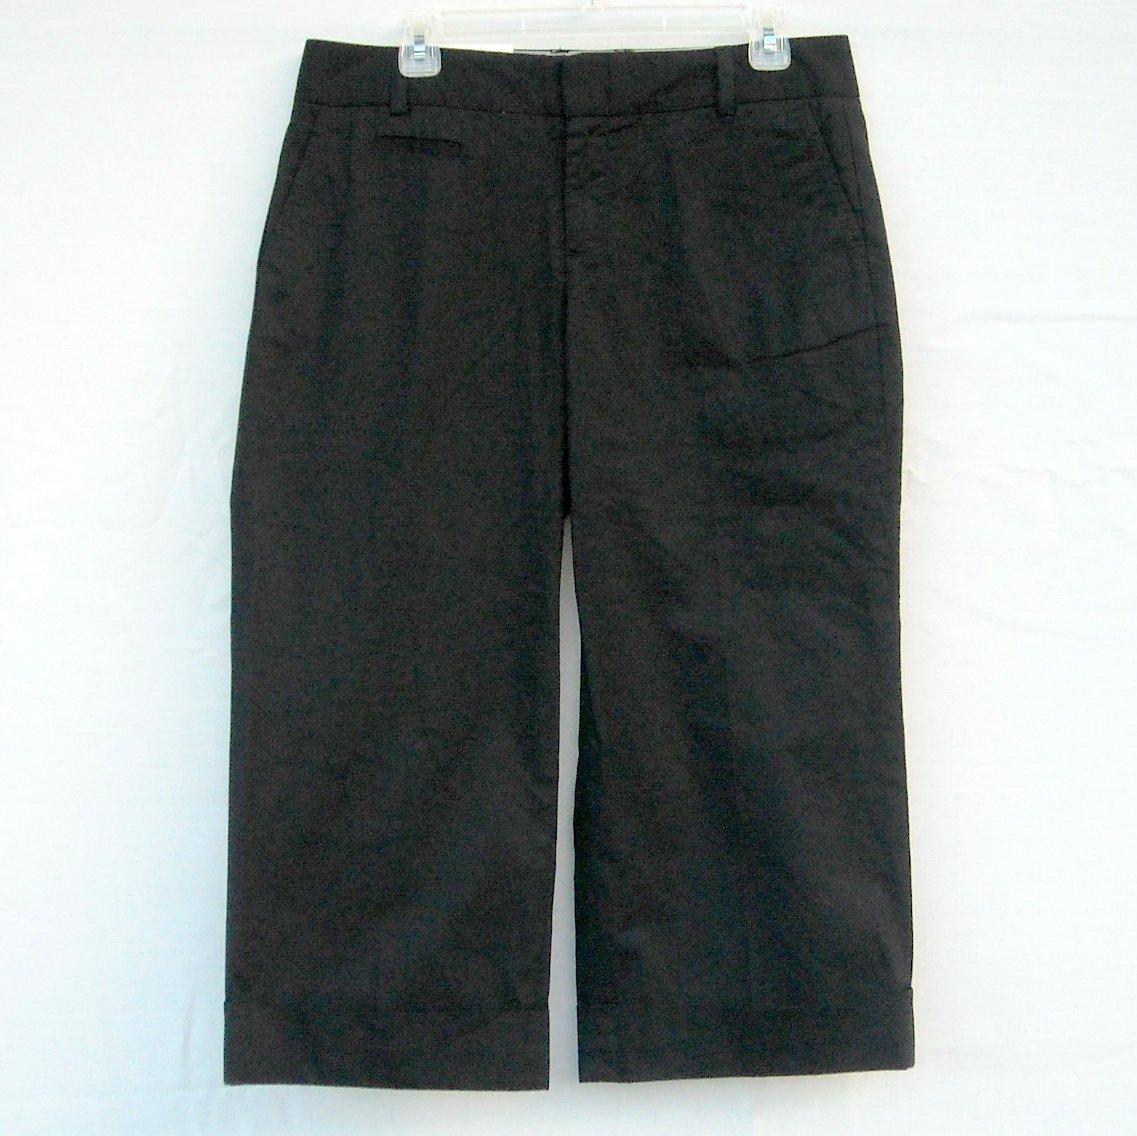 Gap Womens Stretch Black Cotton Capris Pants size 10